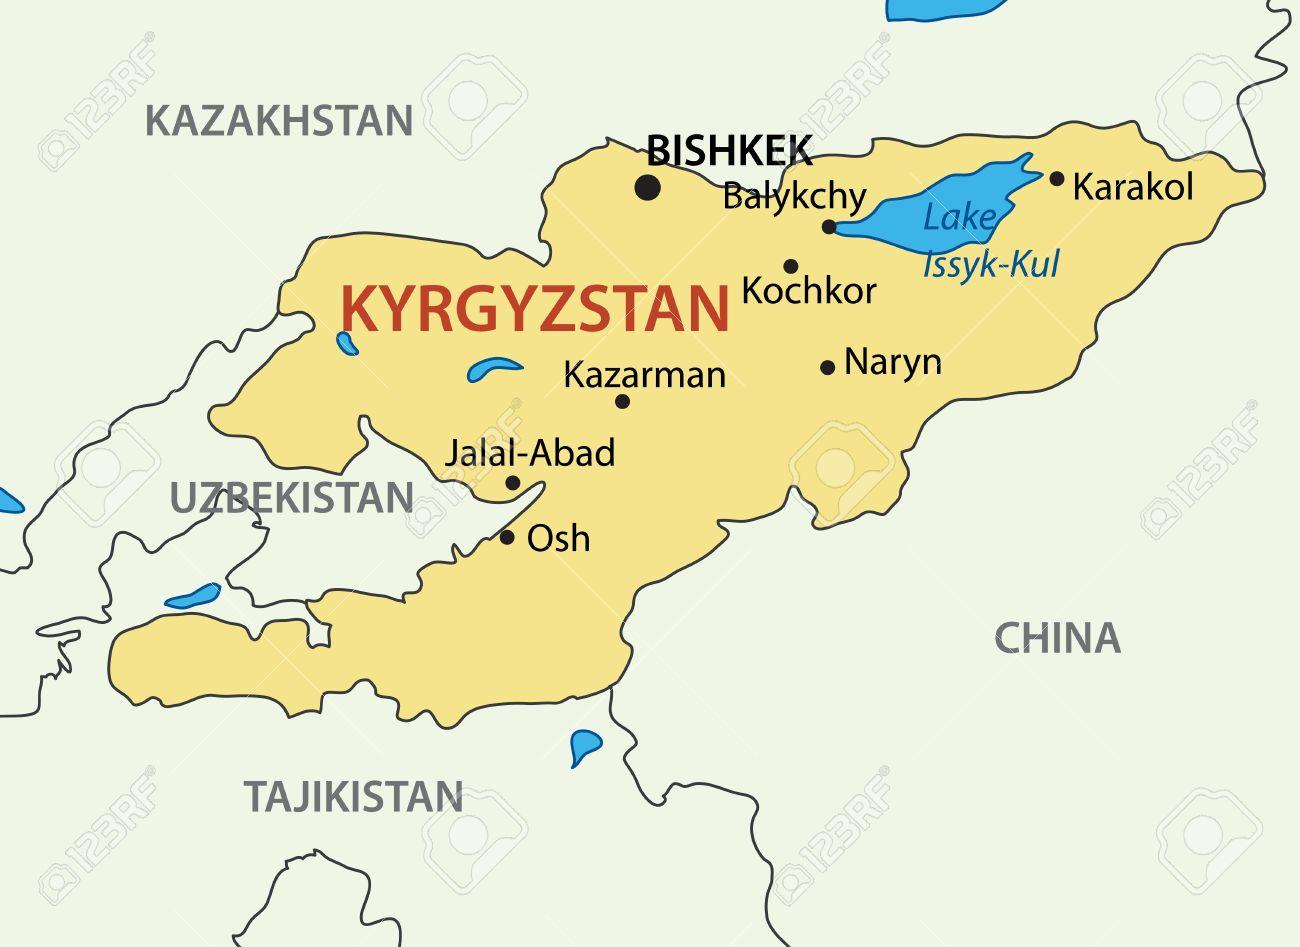 Kyrgyz Republic Kyrgyzstan Map Royalty Free Cliparts Vectors - Kyrgyzstan map